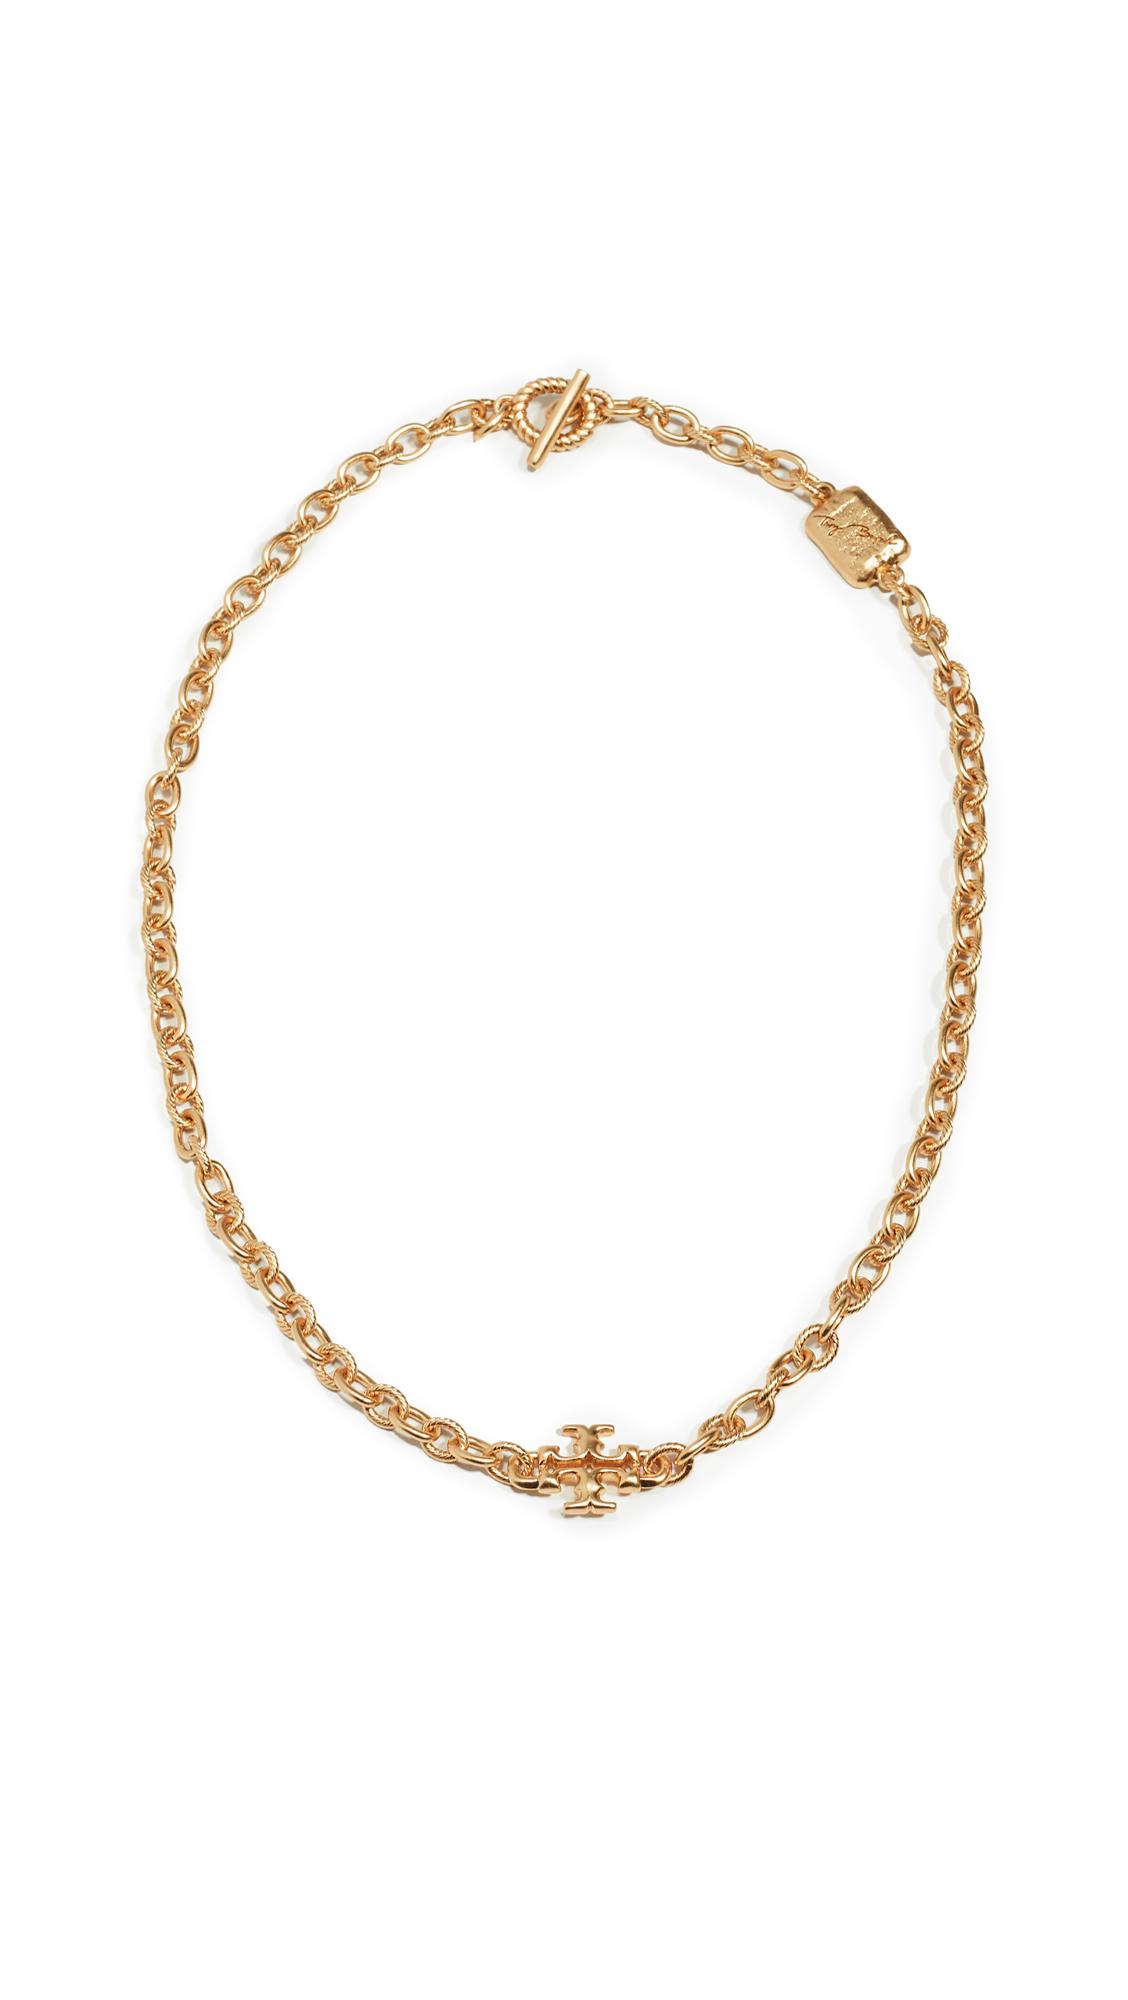 Tory Burch Torsade Short Necklace